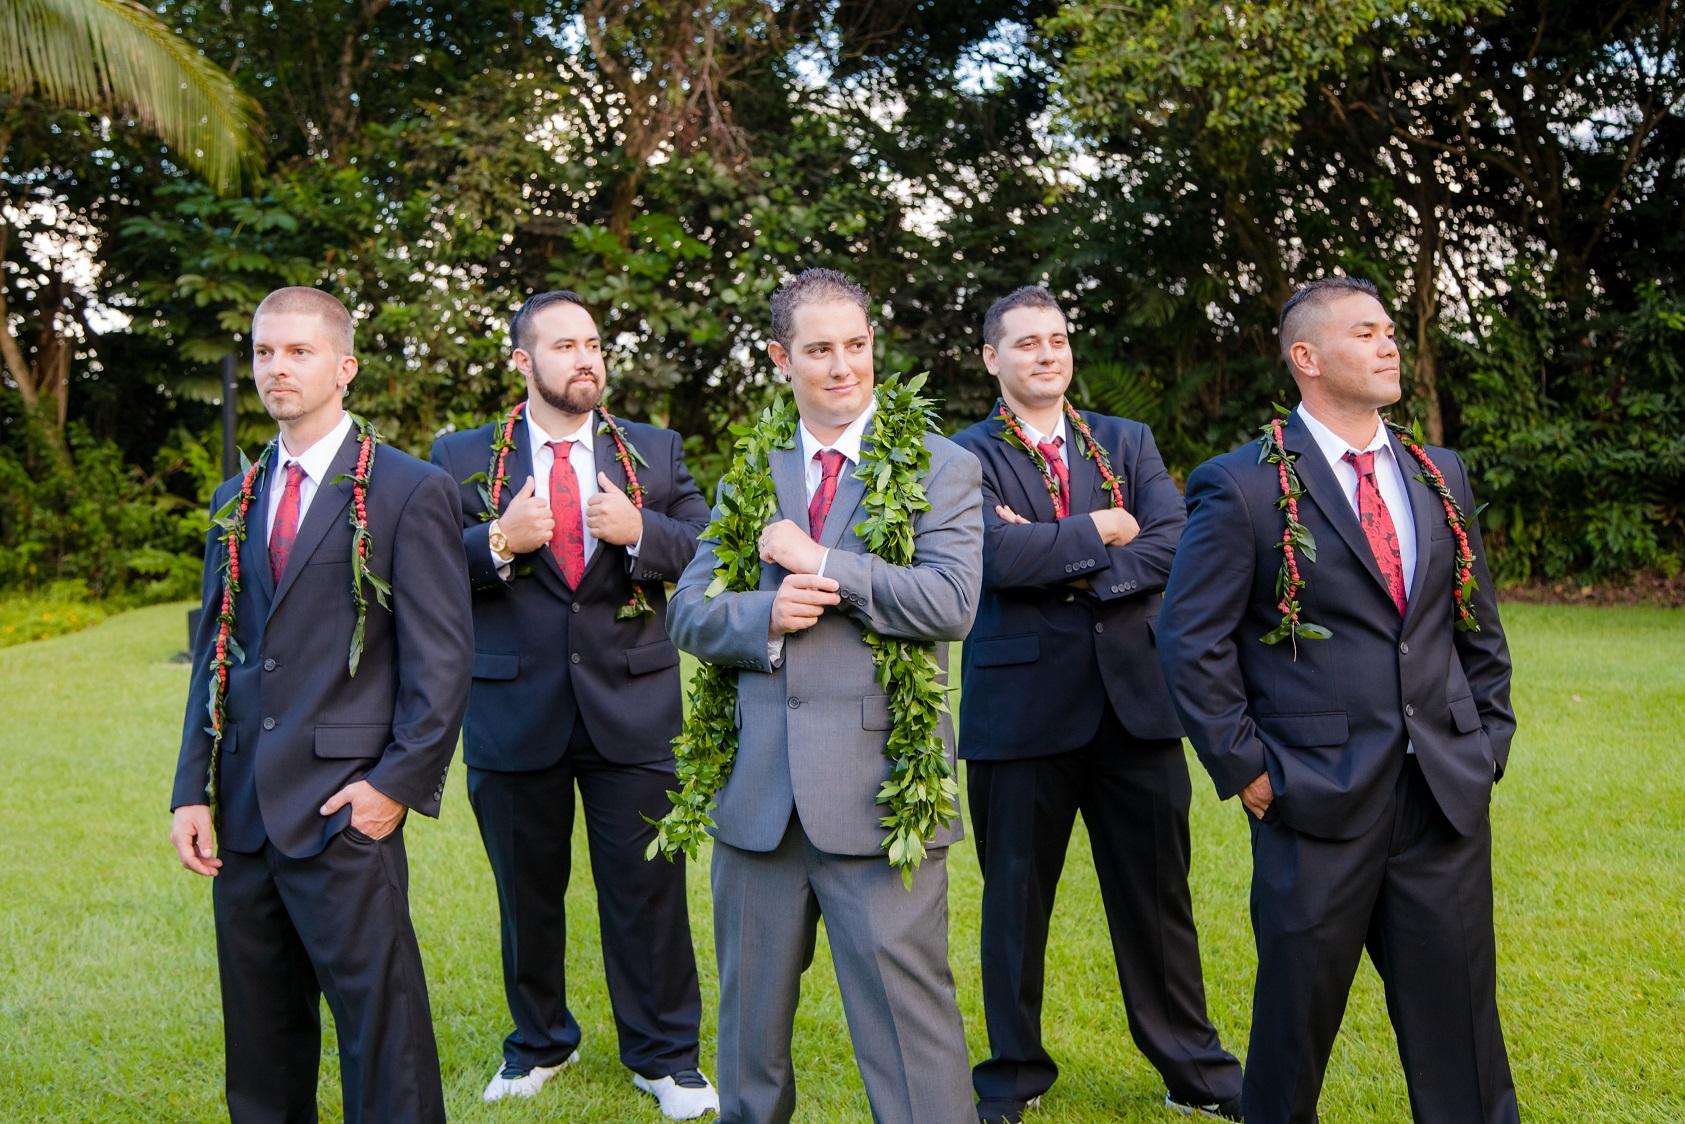 groomsmen oahu destination wedding photography